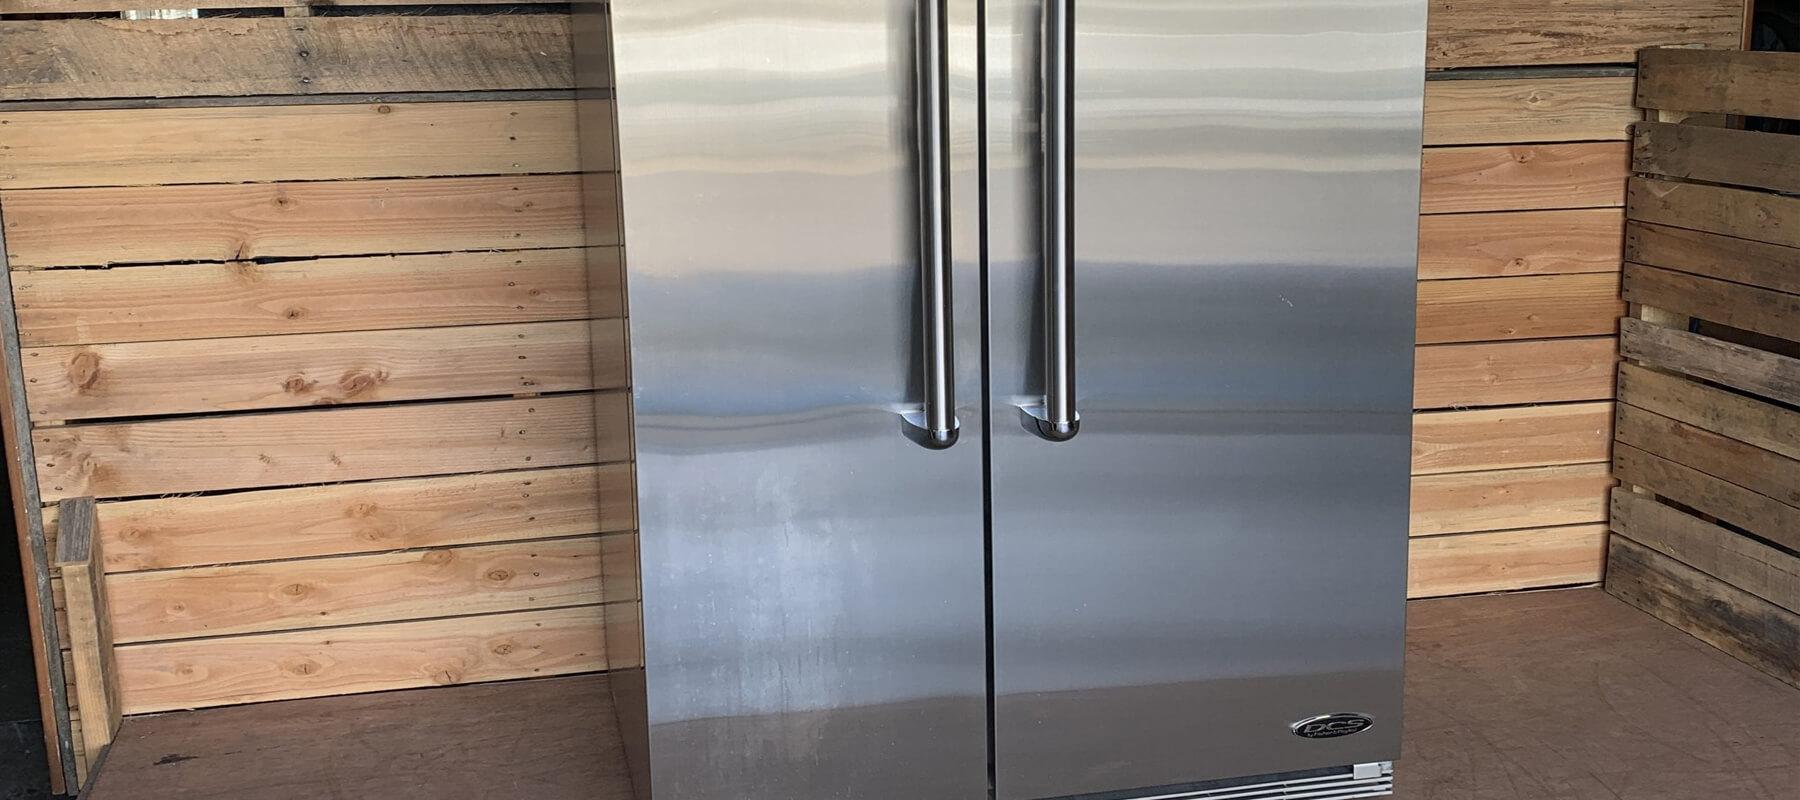 DCS Authorized Service | Built-in Refrigerator Repair